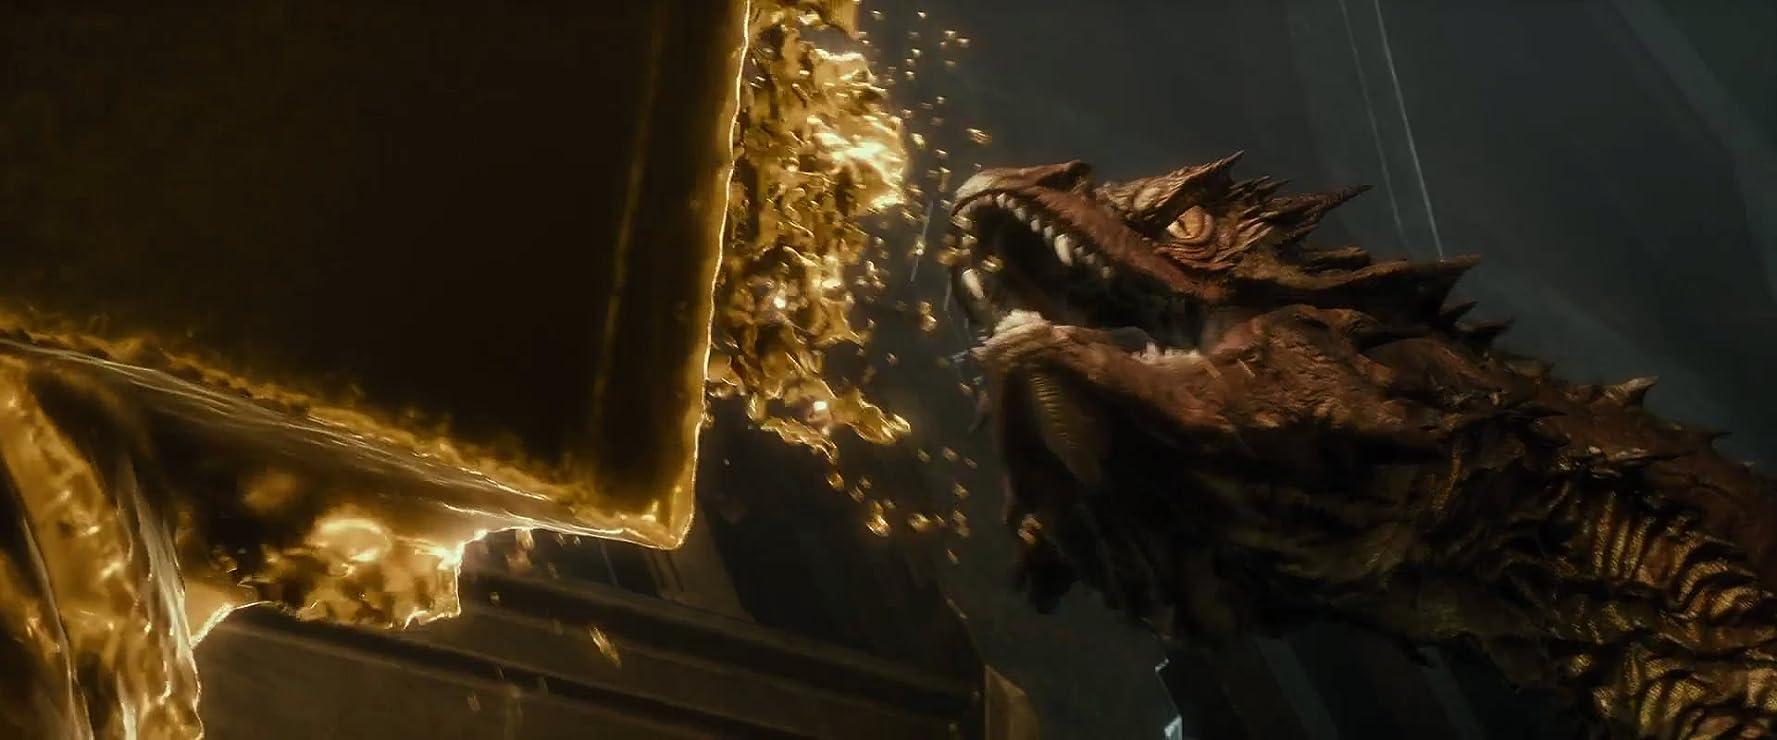 Hobbitul Dezolarea lui Smaug (2013) Film Online Subtitrat